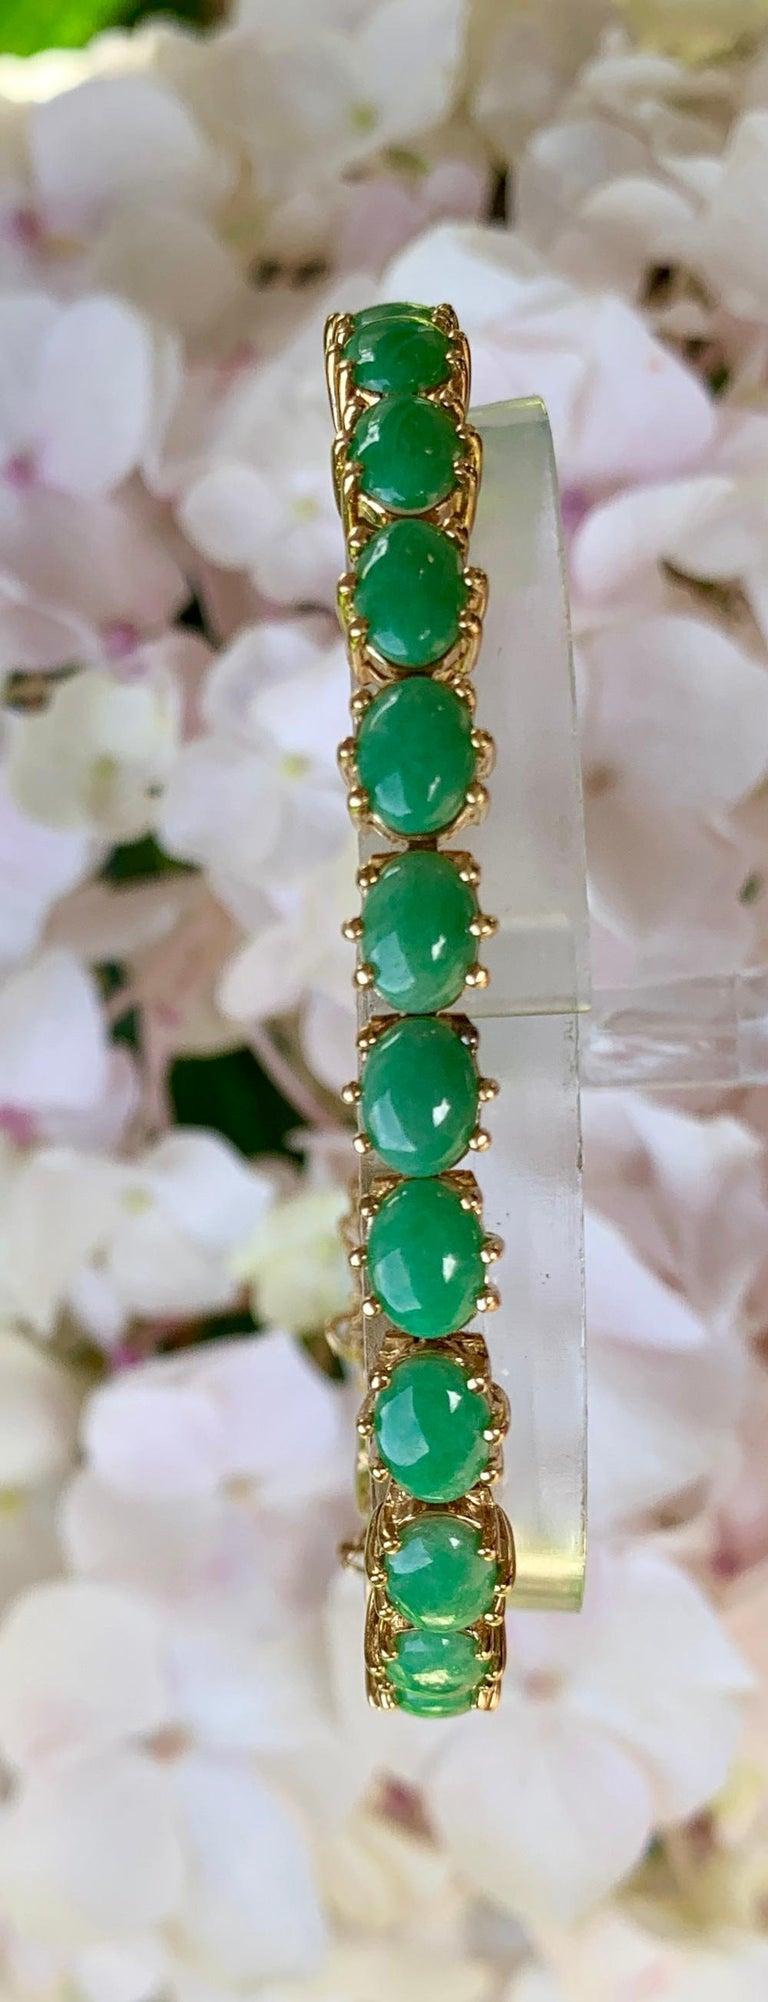 Classic 15.75 Carat Apple Green Jade Yellow Gold Cabochon Tennis Bracelet For Sale 3